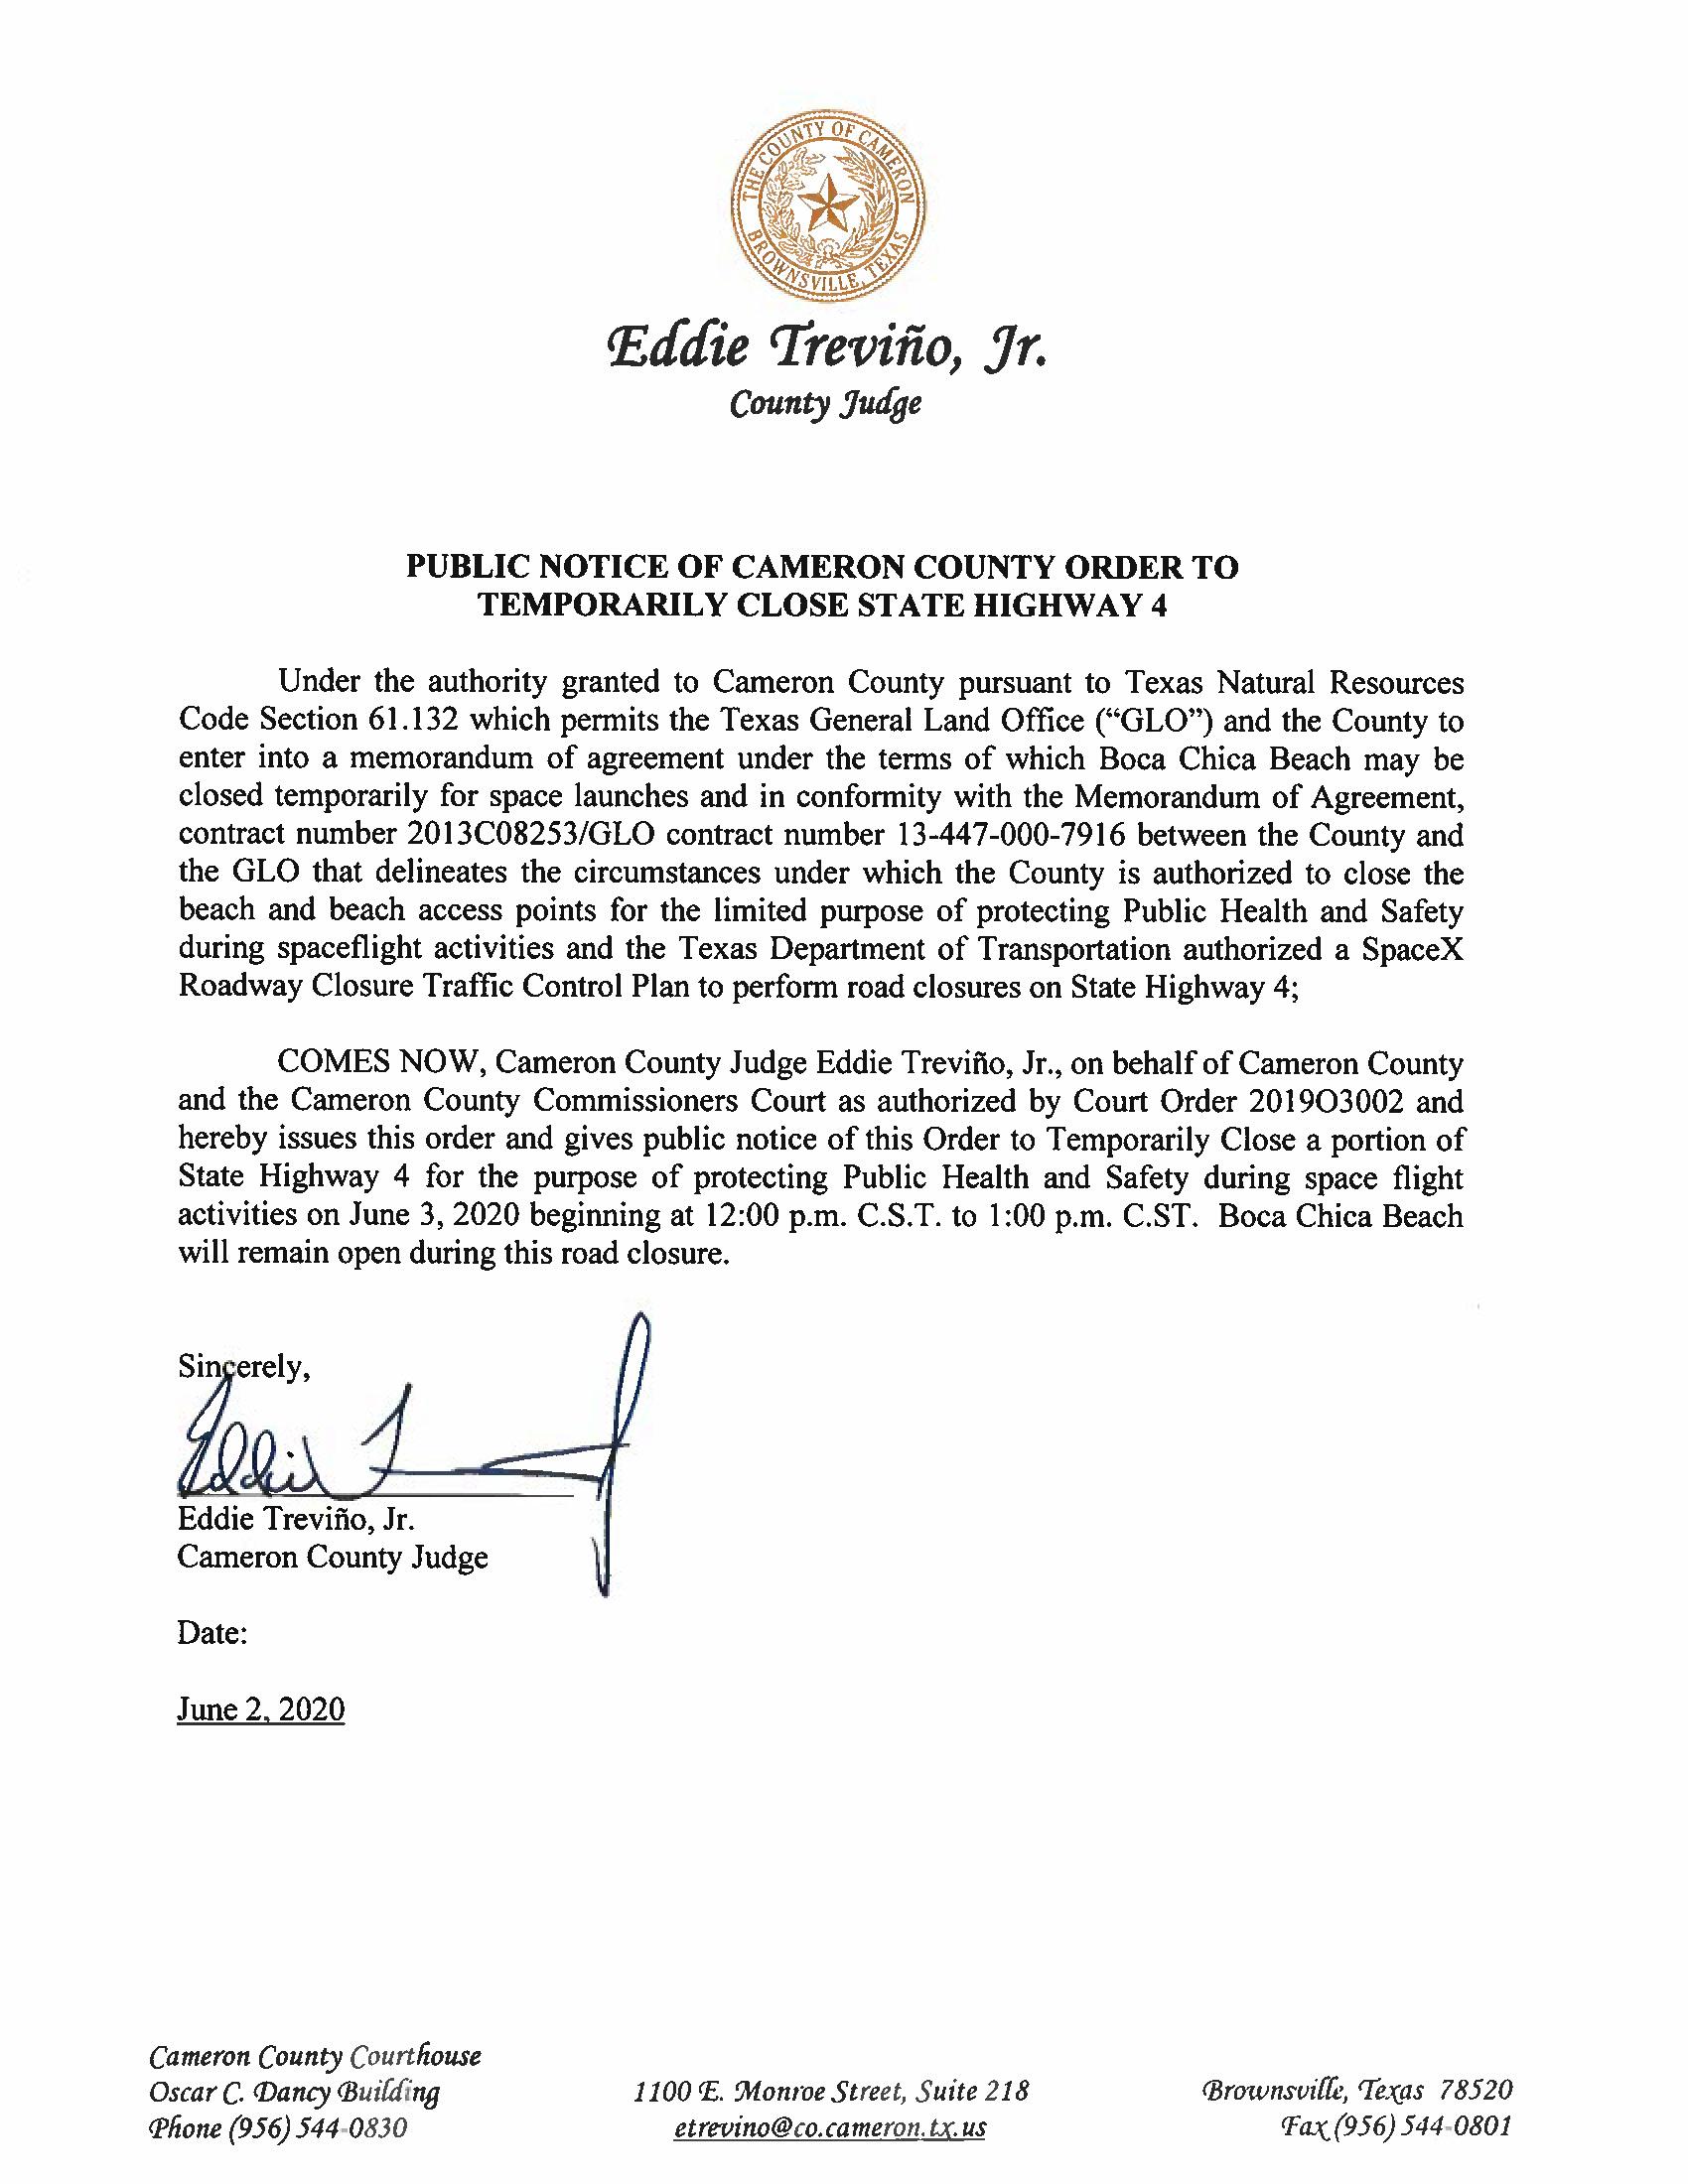 PUBLIC NOTICE OF CAMERON COUNTY ORDER TO TEMP. ROAD CLOSURE. 06.03.20